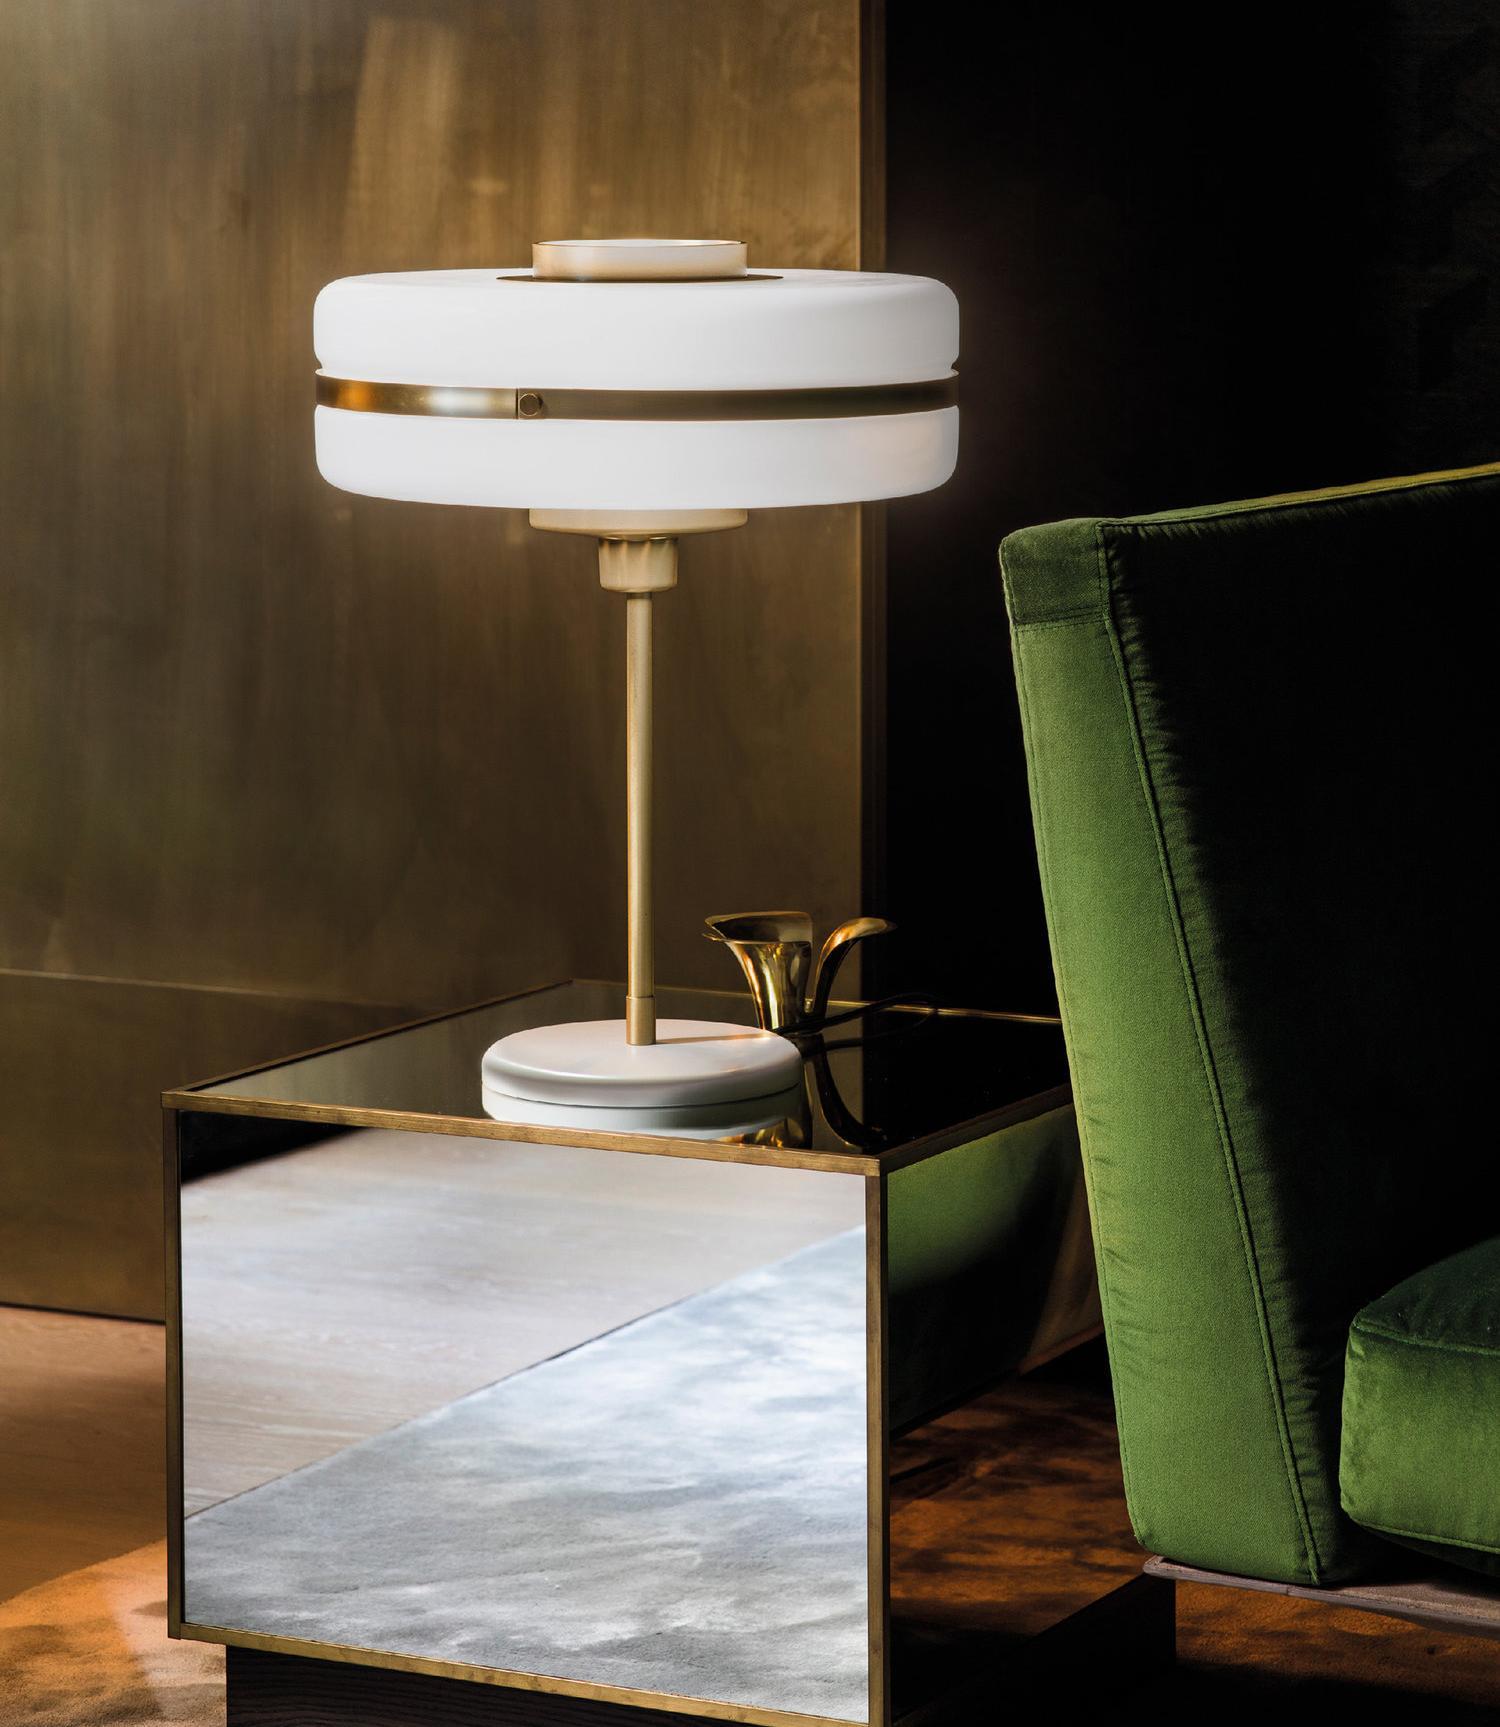 Bertfrank Настольная лампа Masina от английского бренда Bert Frank